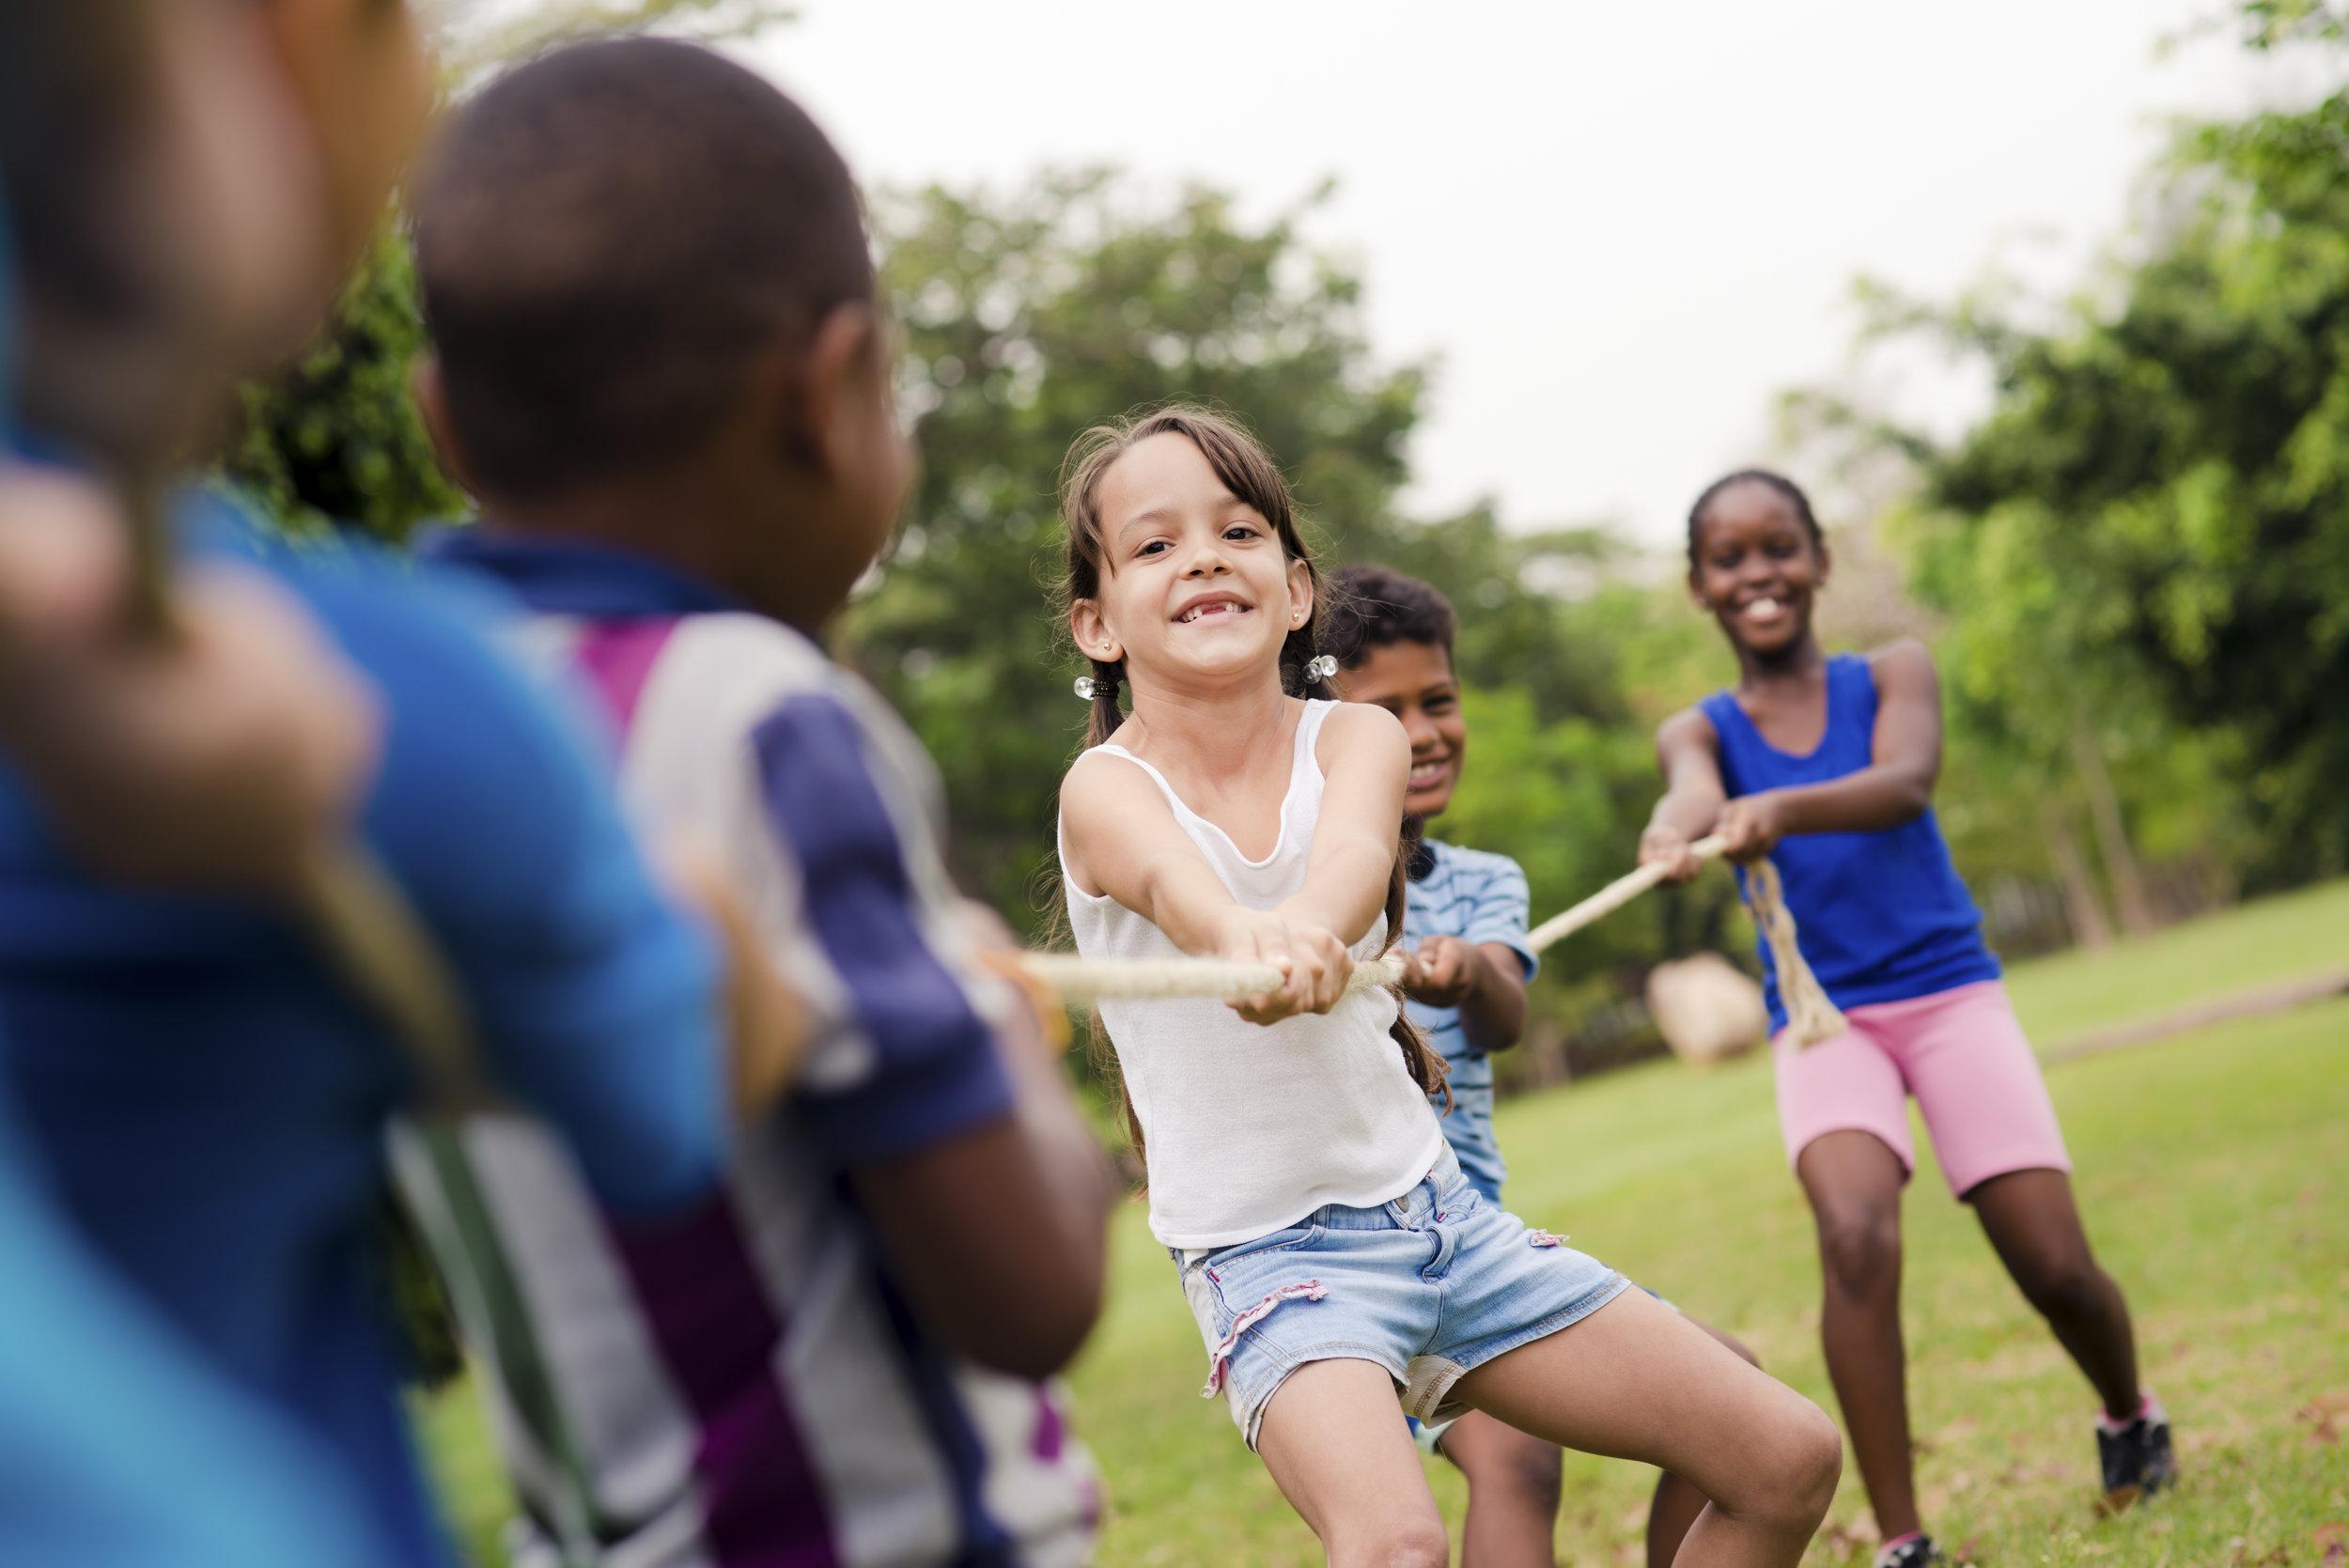 happy-school-children-playing-tug-of-war-with-PWAZQT9.jpg